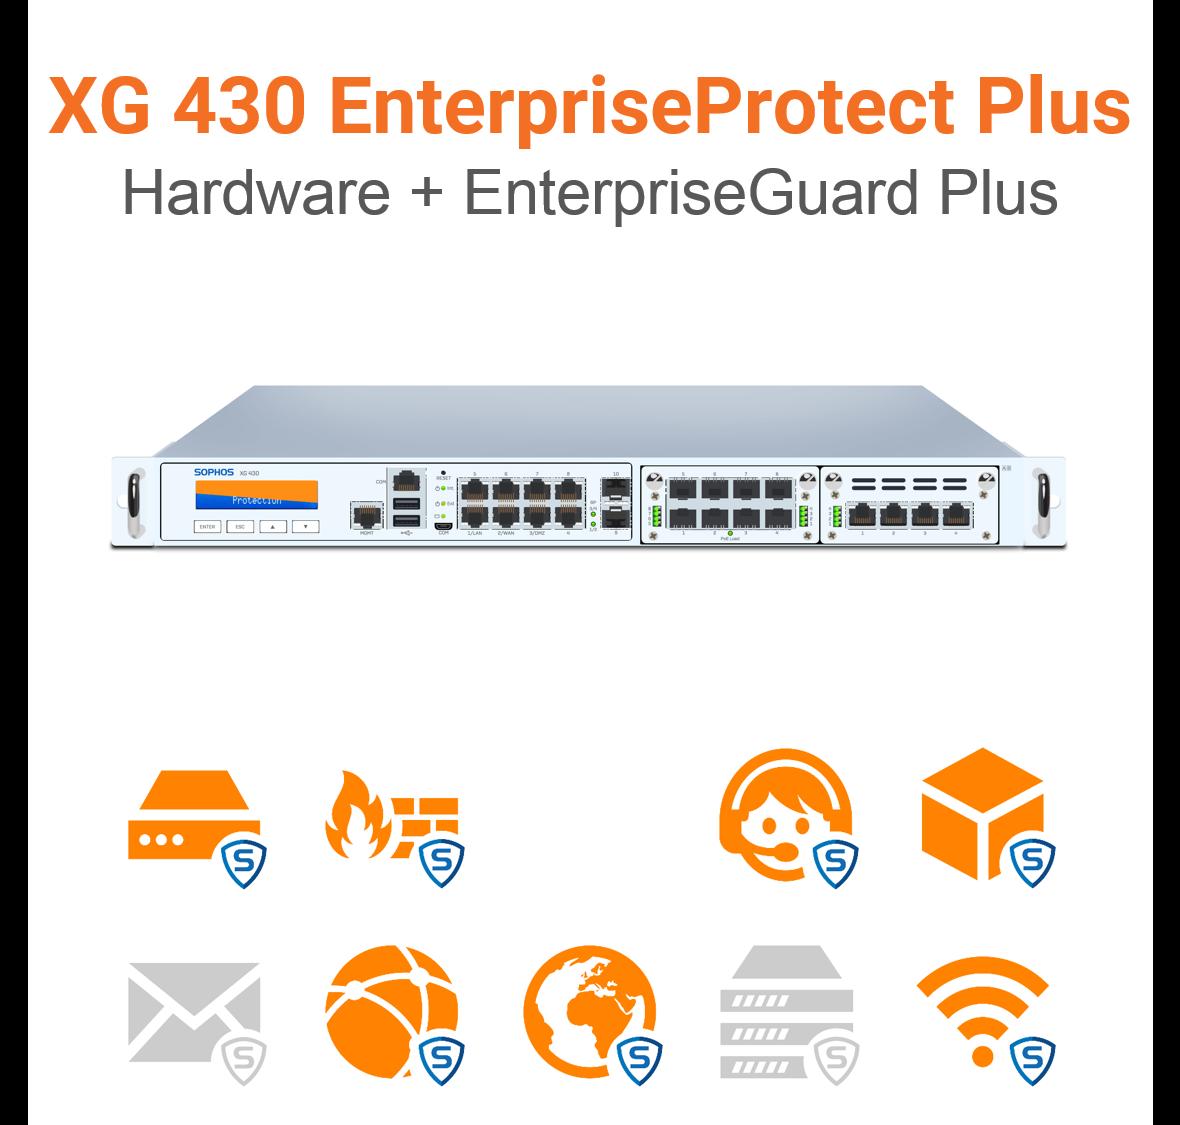 Sophos XG 430 EnterpriseProtect Plus Bundle (Hardware + Lizenz)